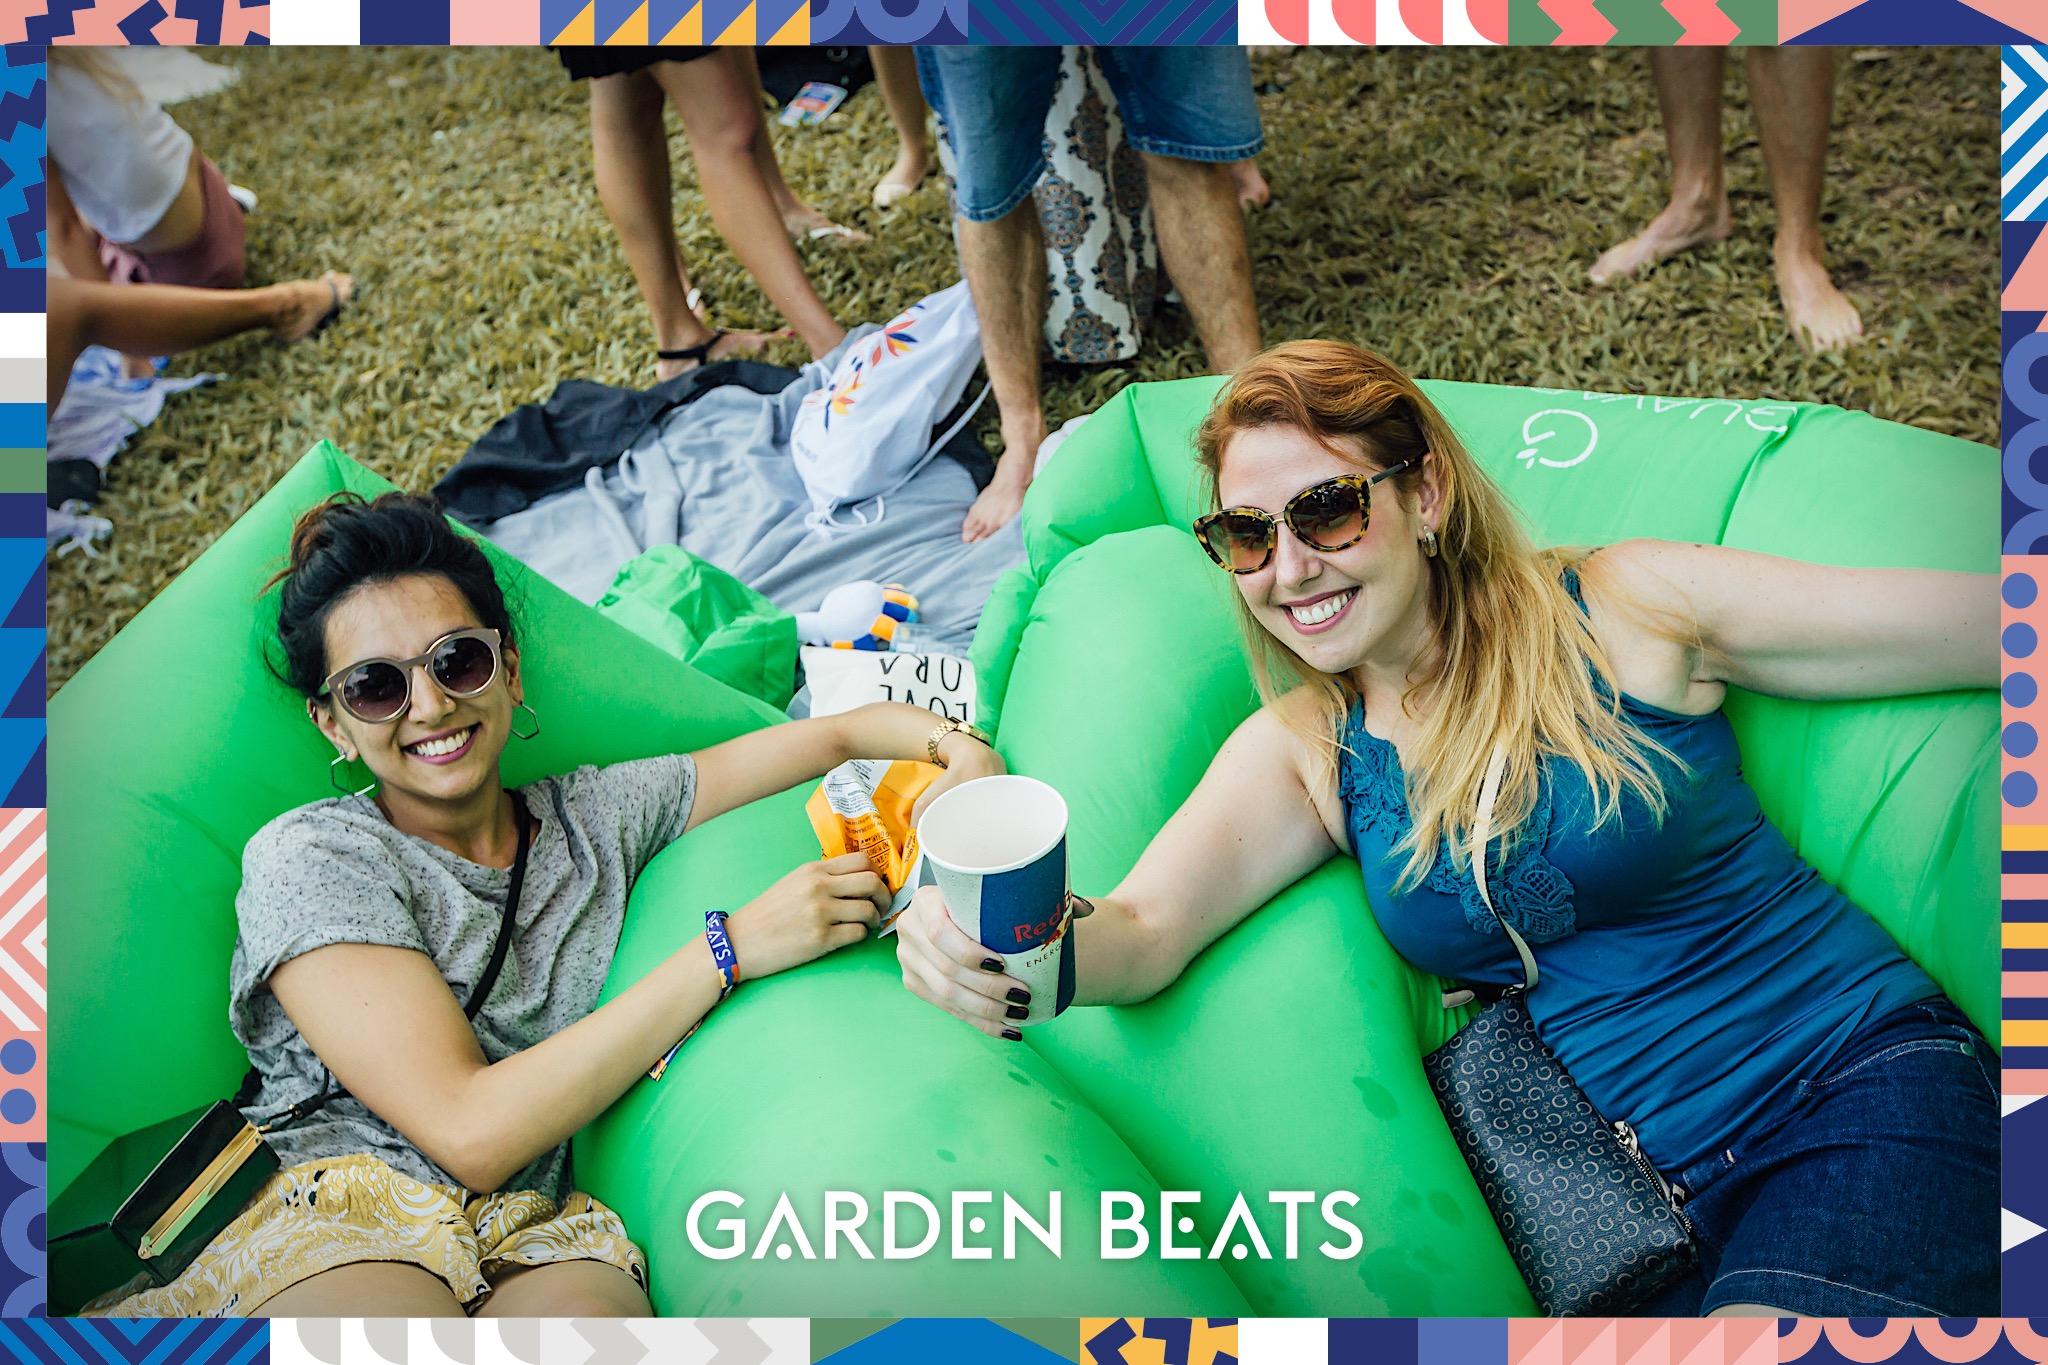 18032017_GardenBeats_Colossal567_WatermarkedGB.jpg